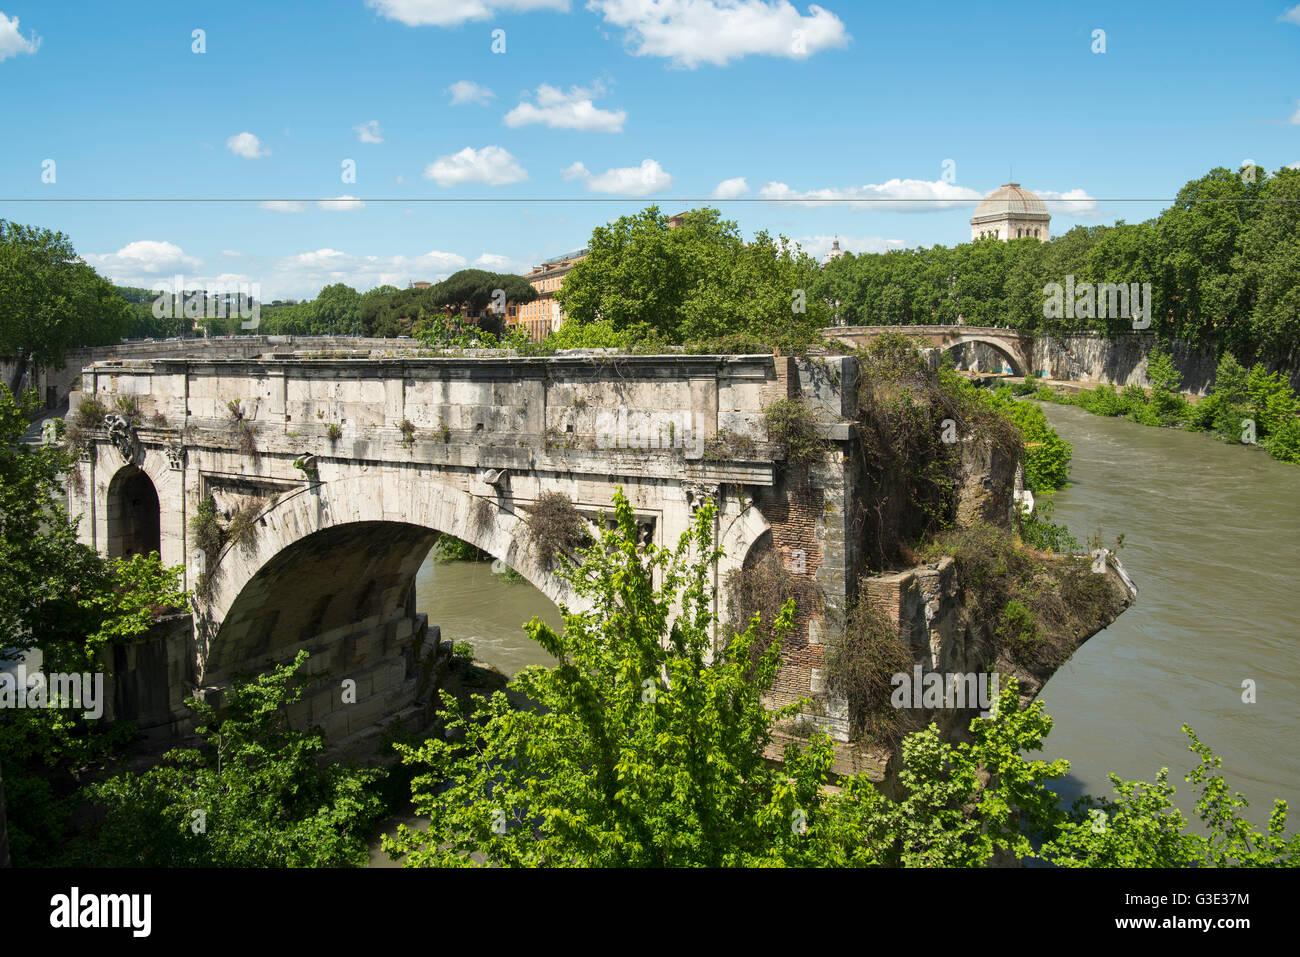 Italien, Rom, Pons Aemilius (Ponte Emilio, Ponte Rotto) nördlich der Ponte Palatino ist die älteste bekannte - Stock Image